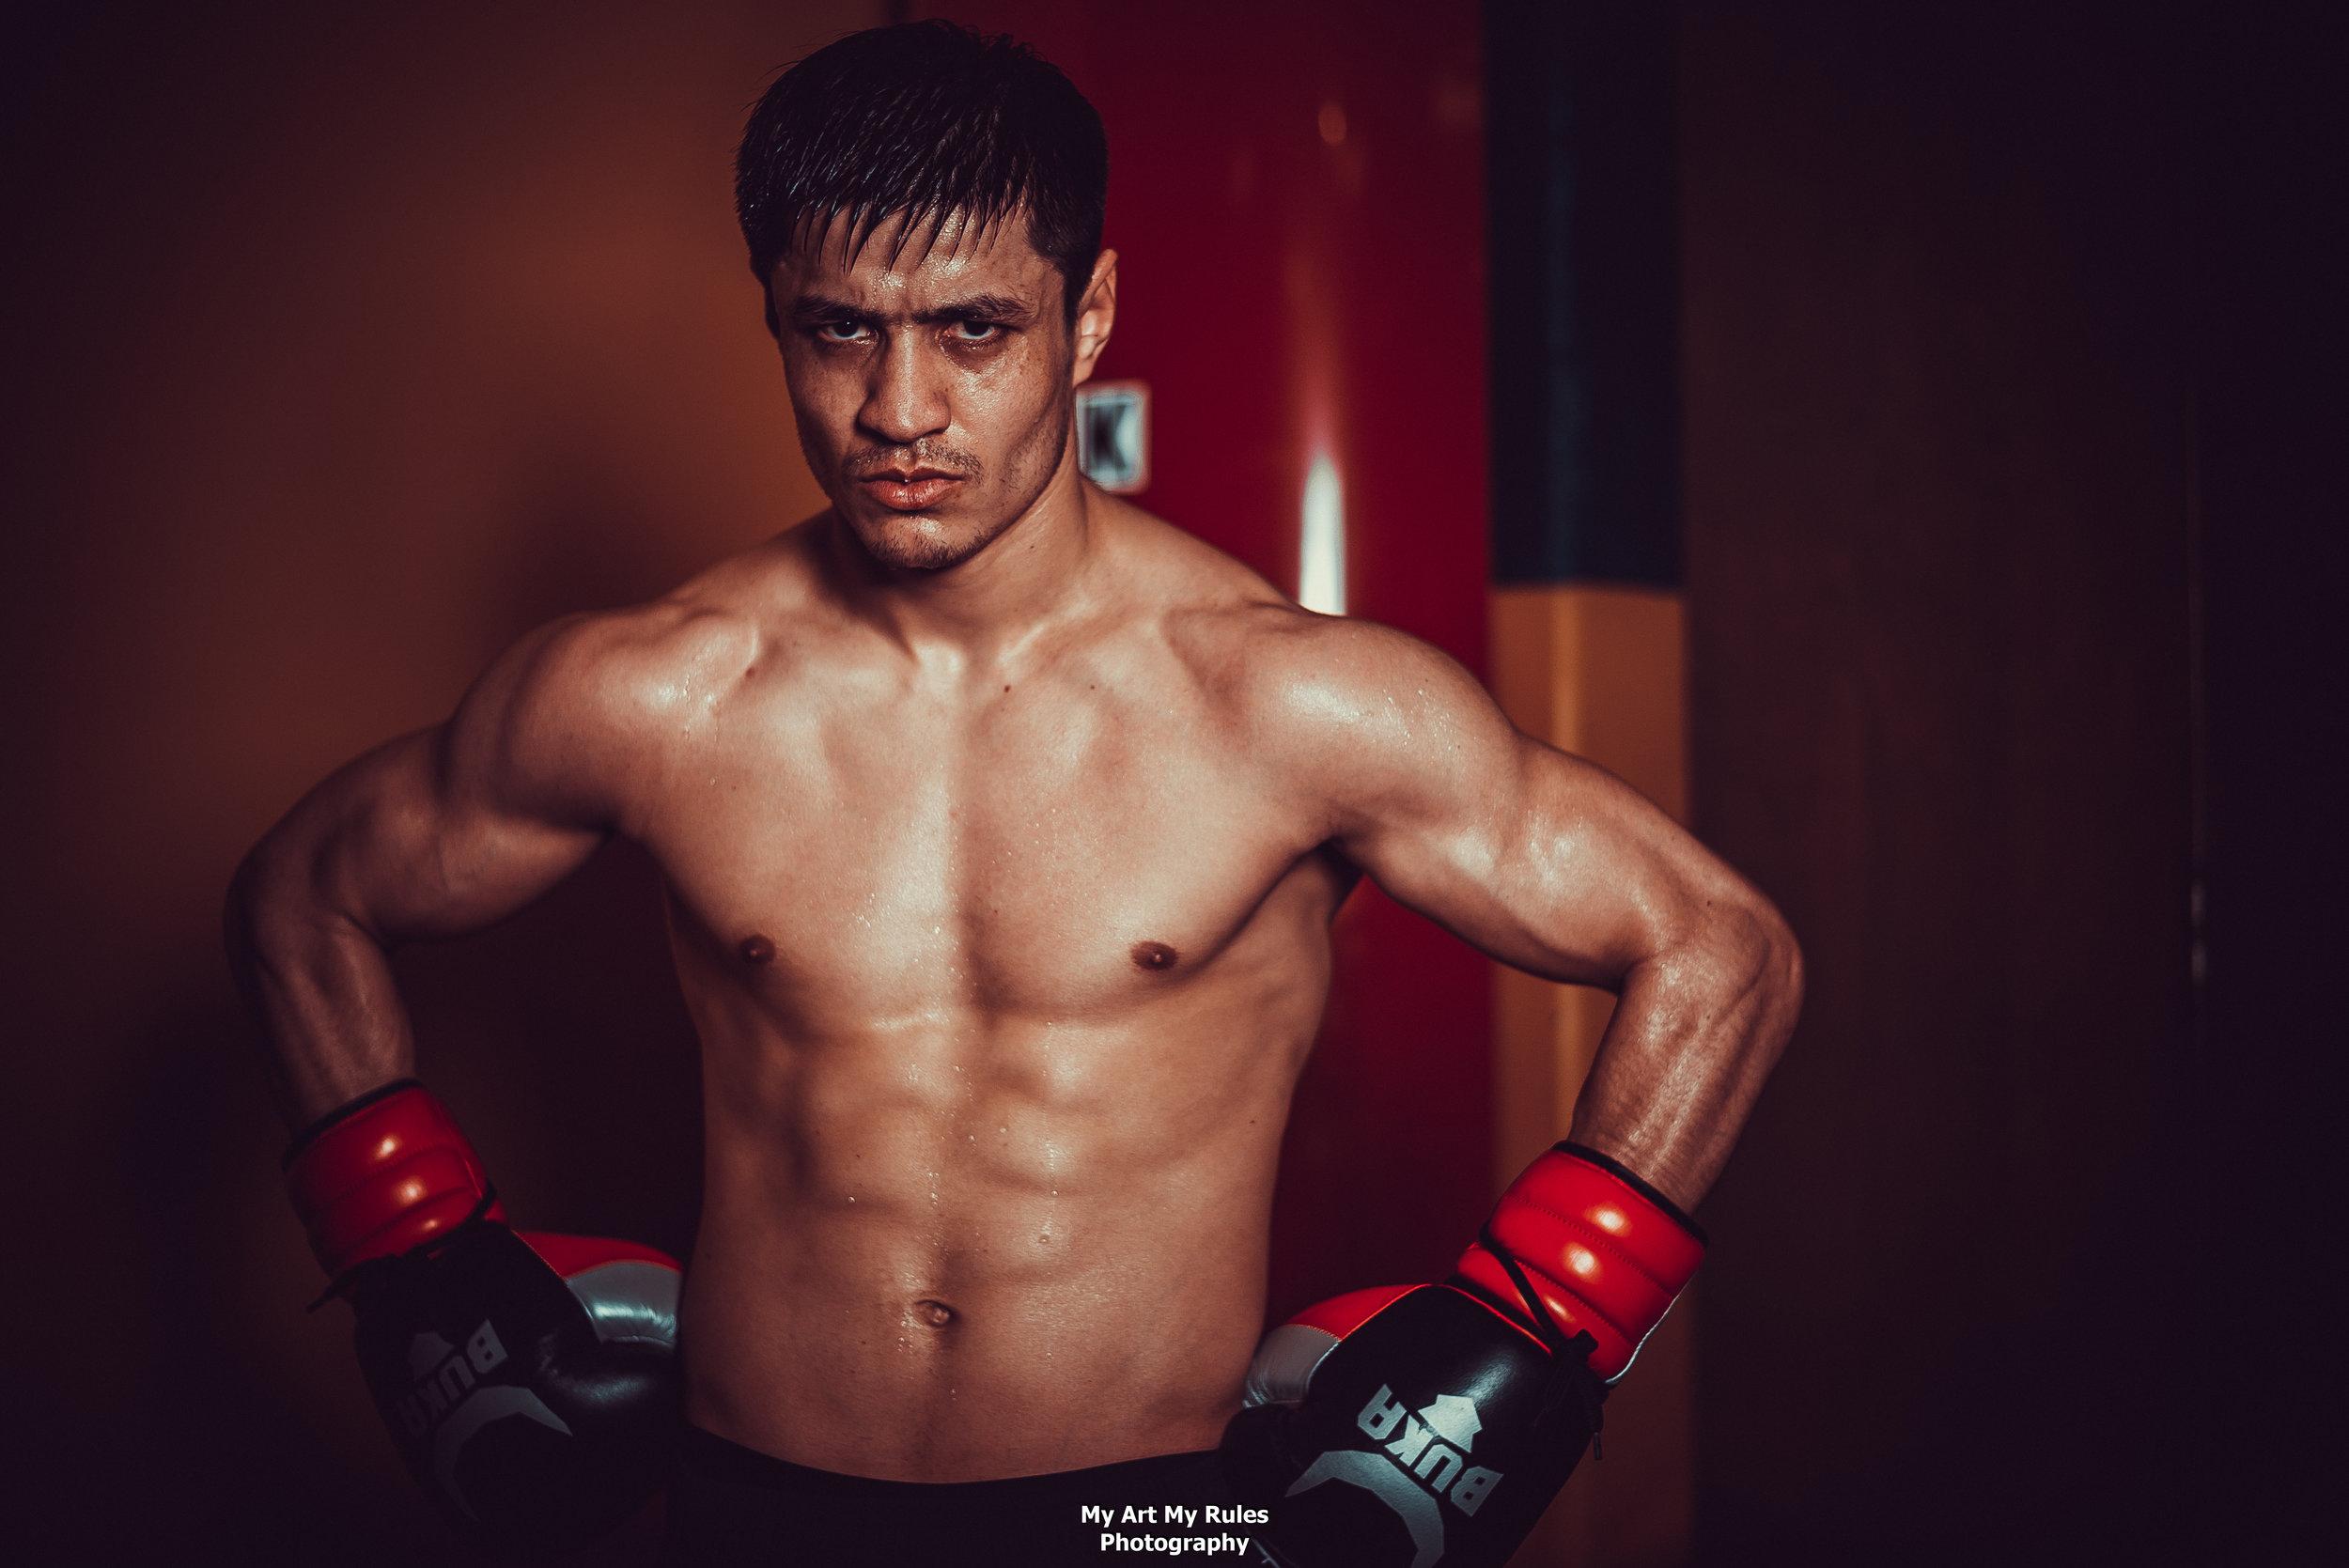 From Uzbekistan To Detroit Shohjahon Ergashev Wins on Showtime's Shobox